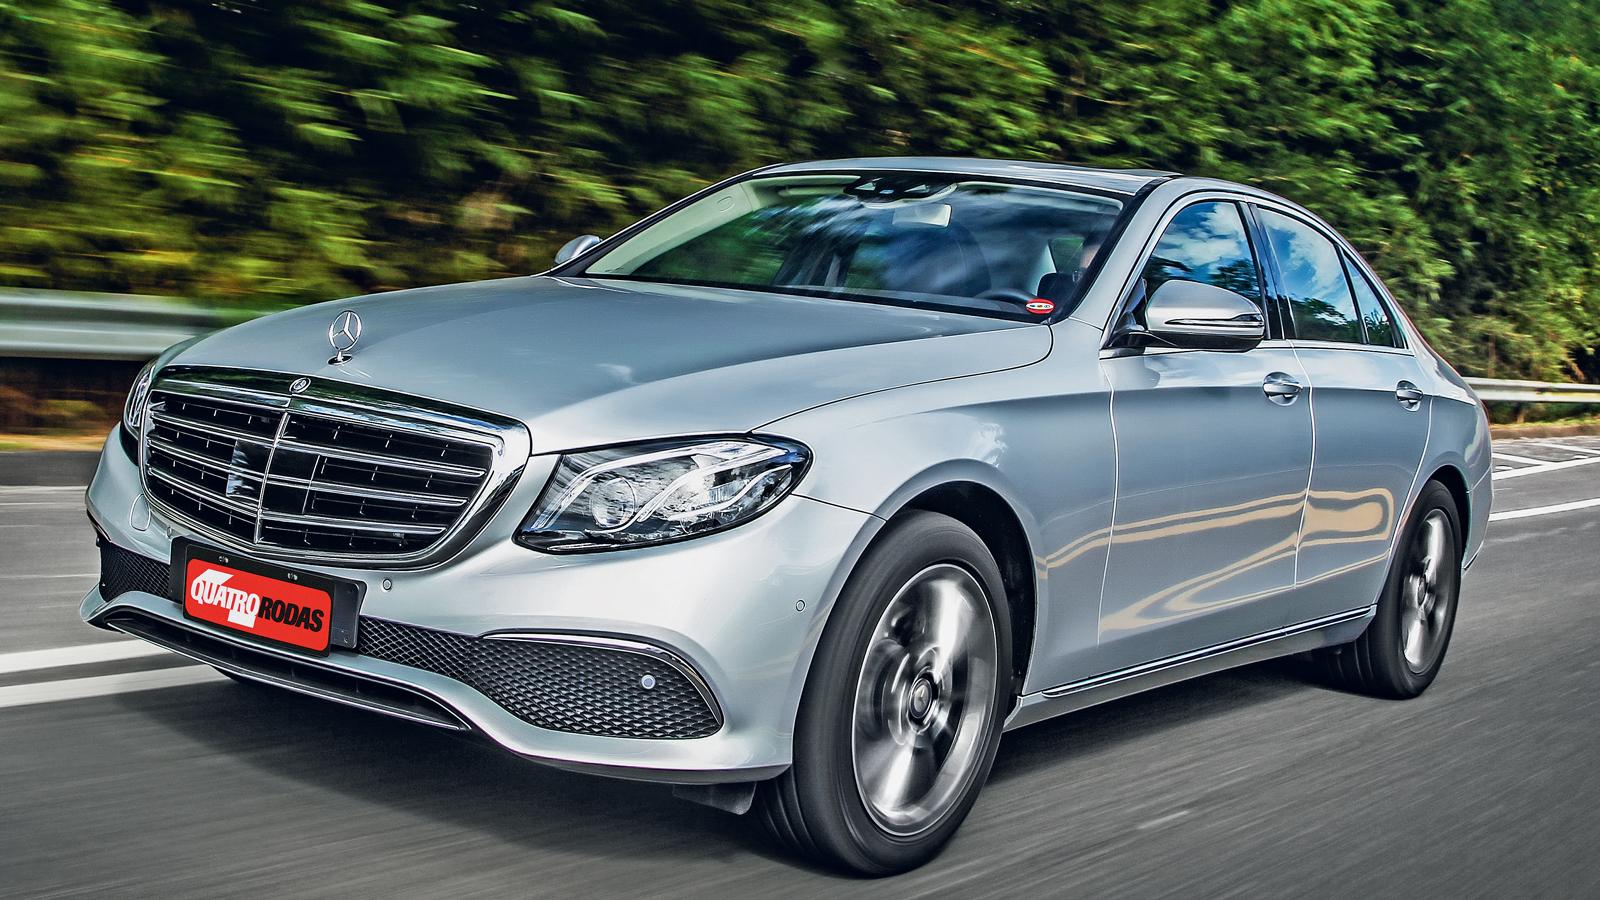 Radar frontal da Mercedes E 250 custa R$19.600